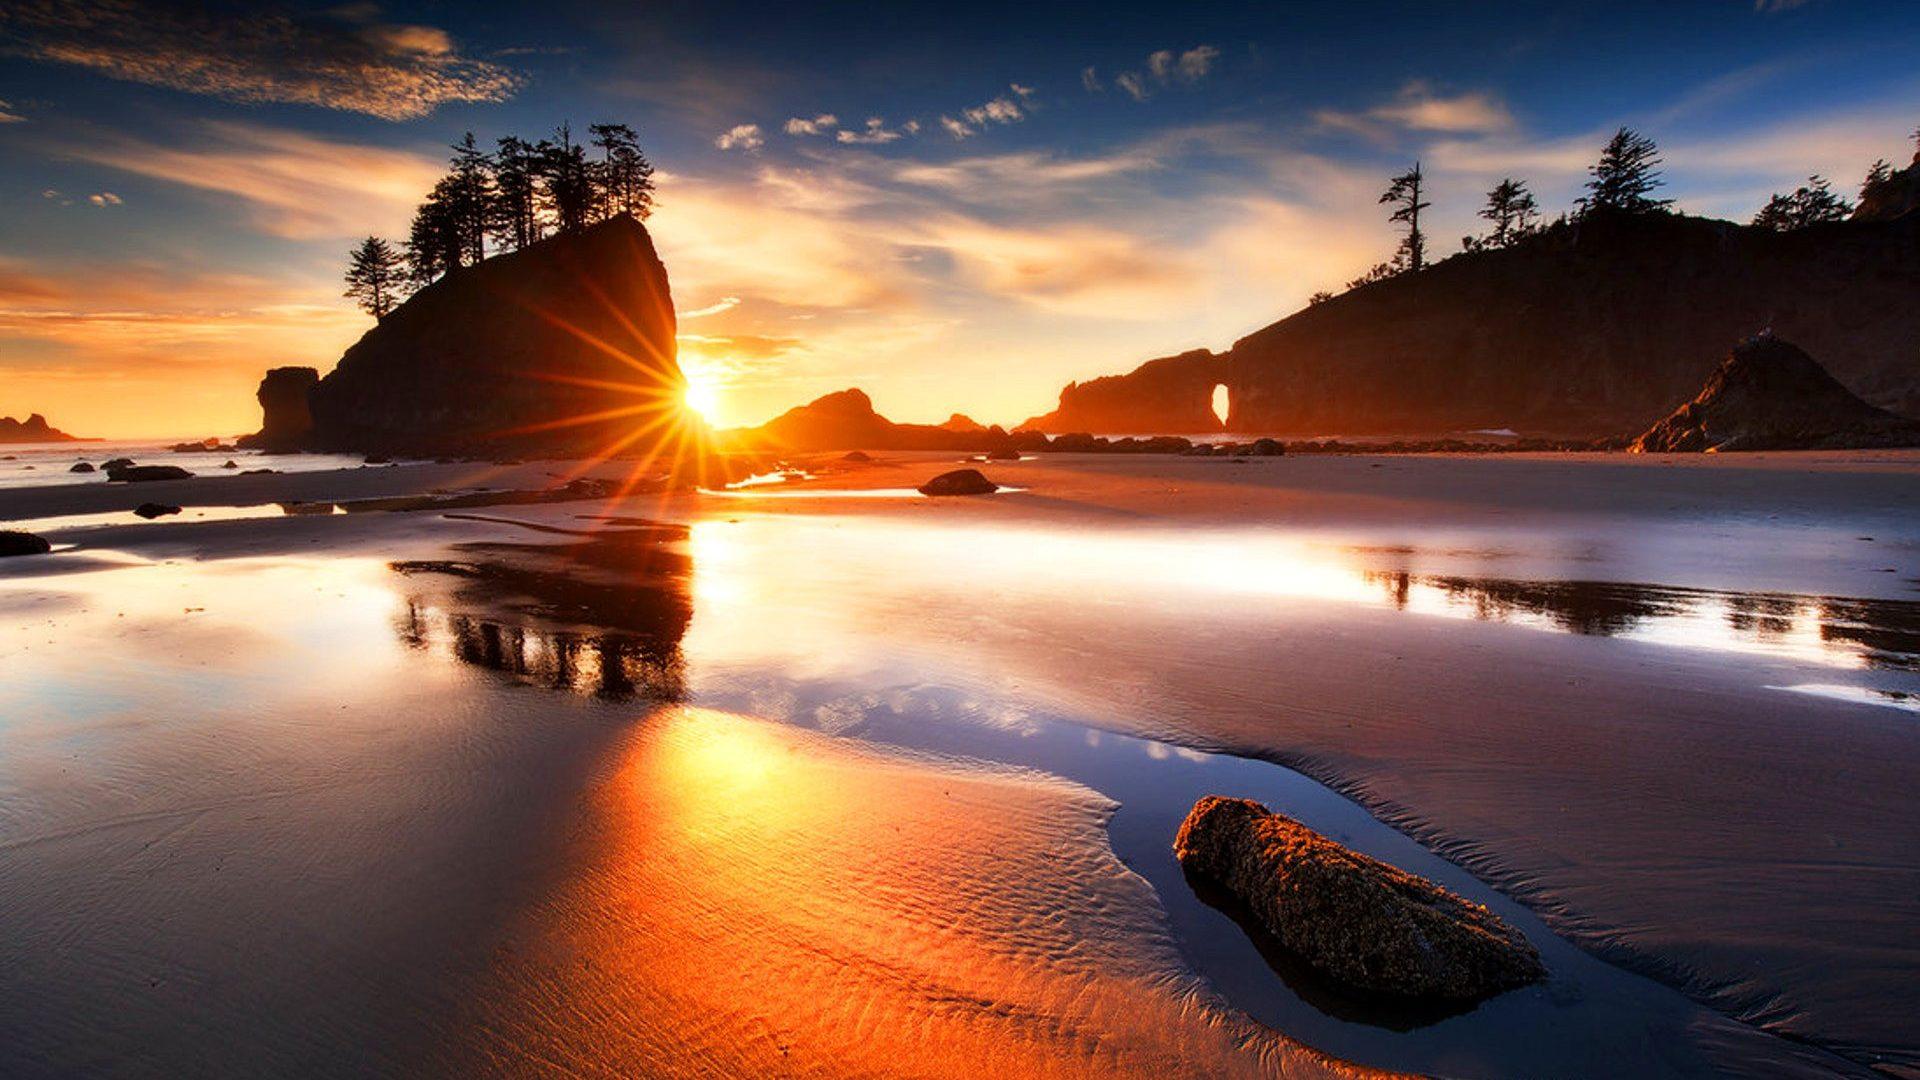 Beach: Stones Hills Sunrise Sunlight Nature Summer Sea Isle Rocks.